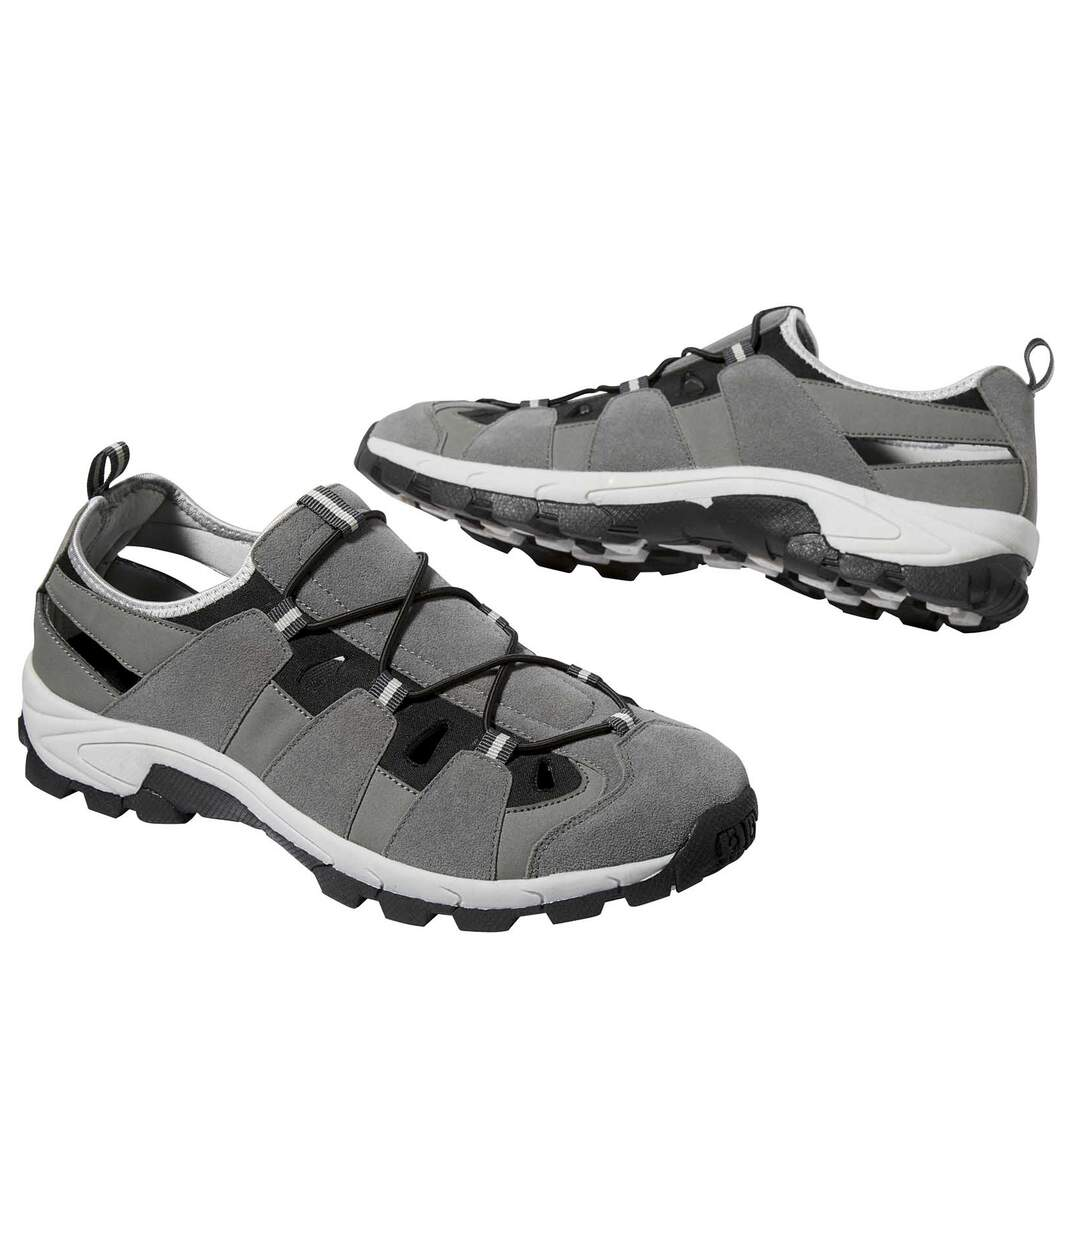 Outdoor-Schuhe Atlas For Men